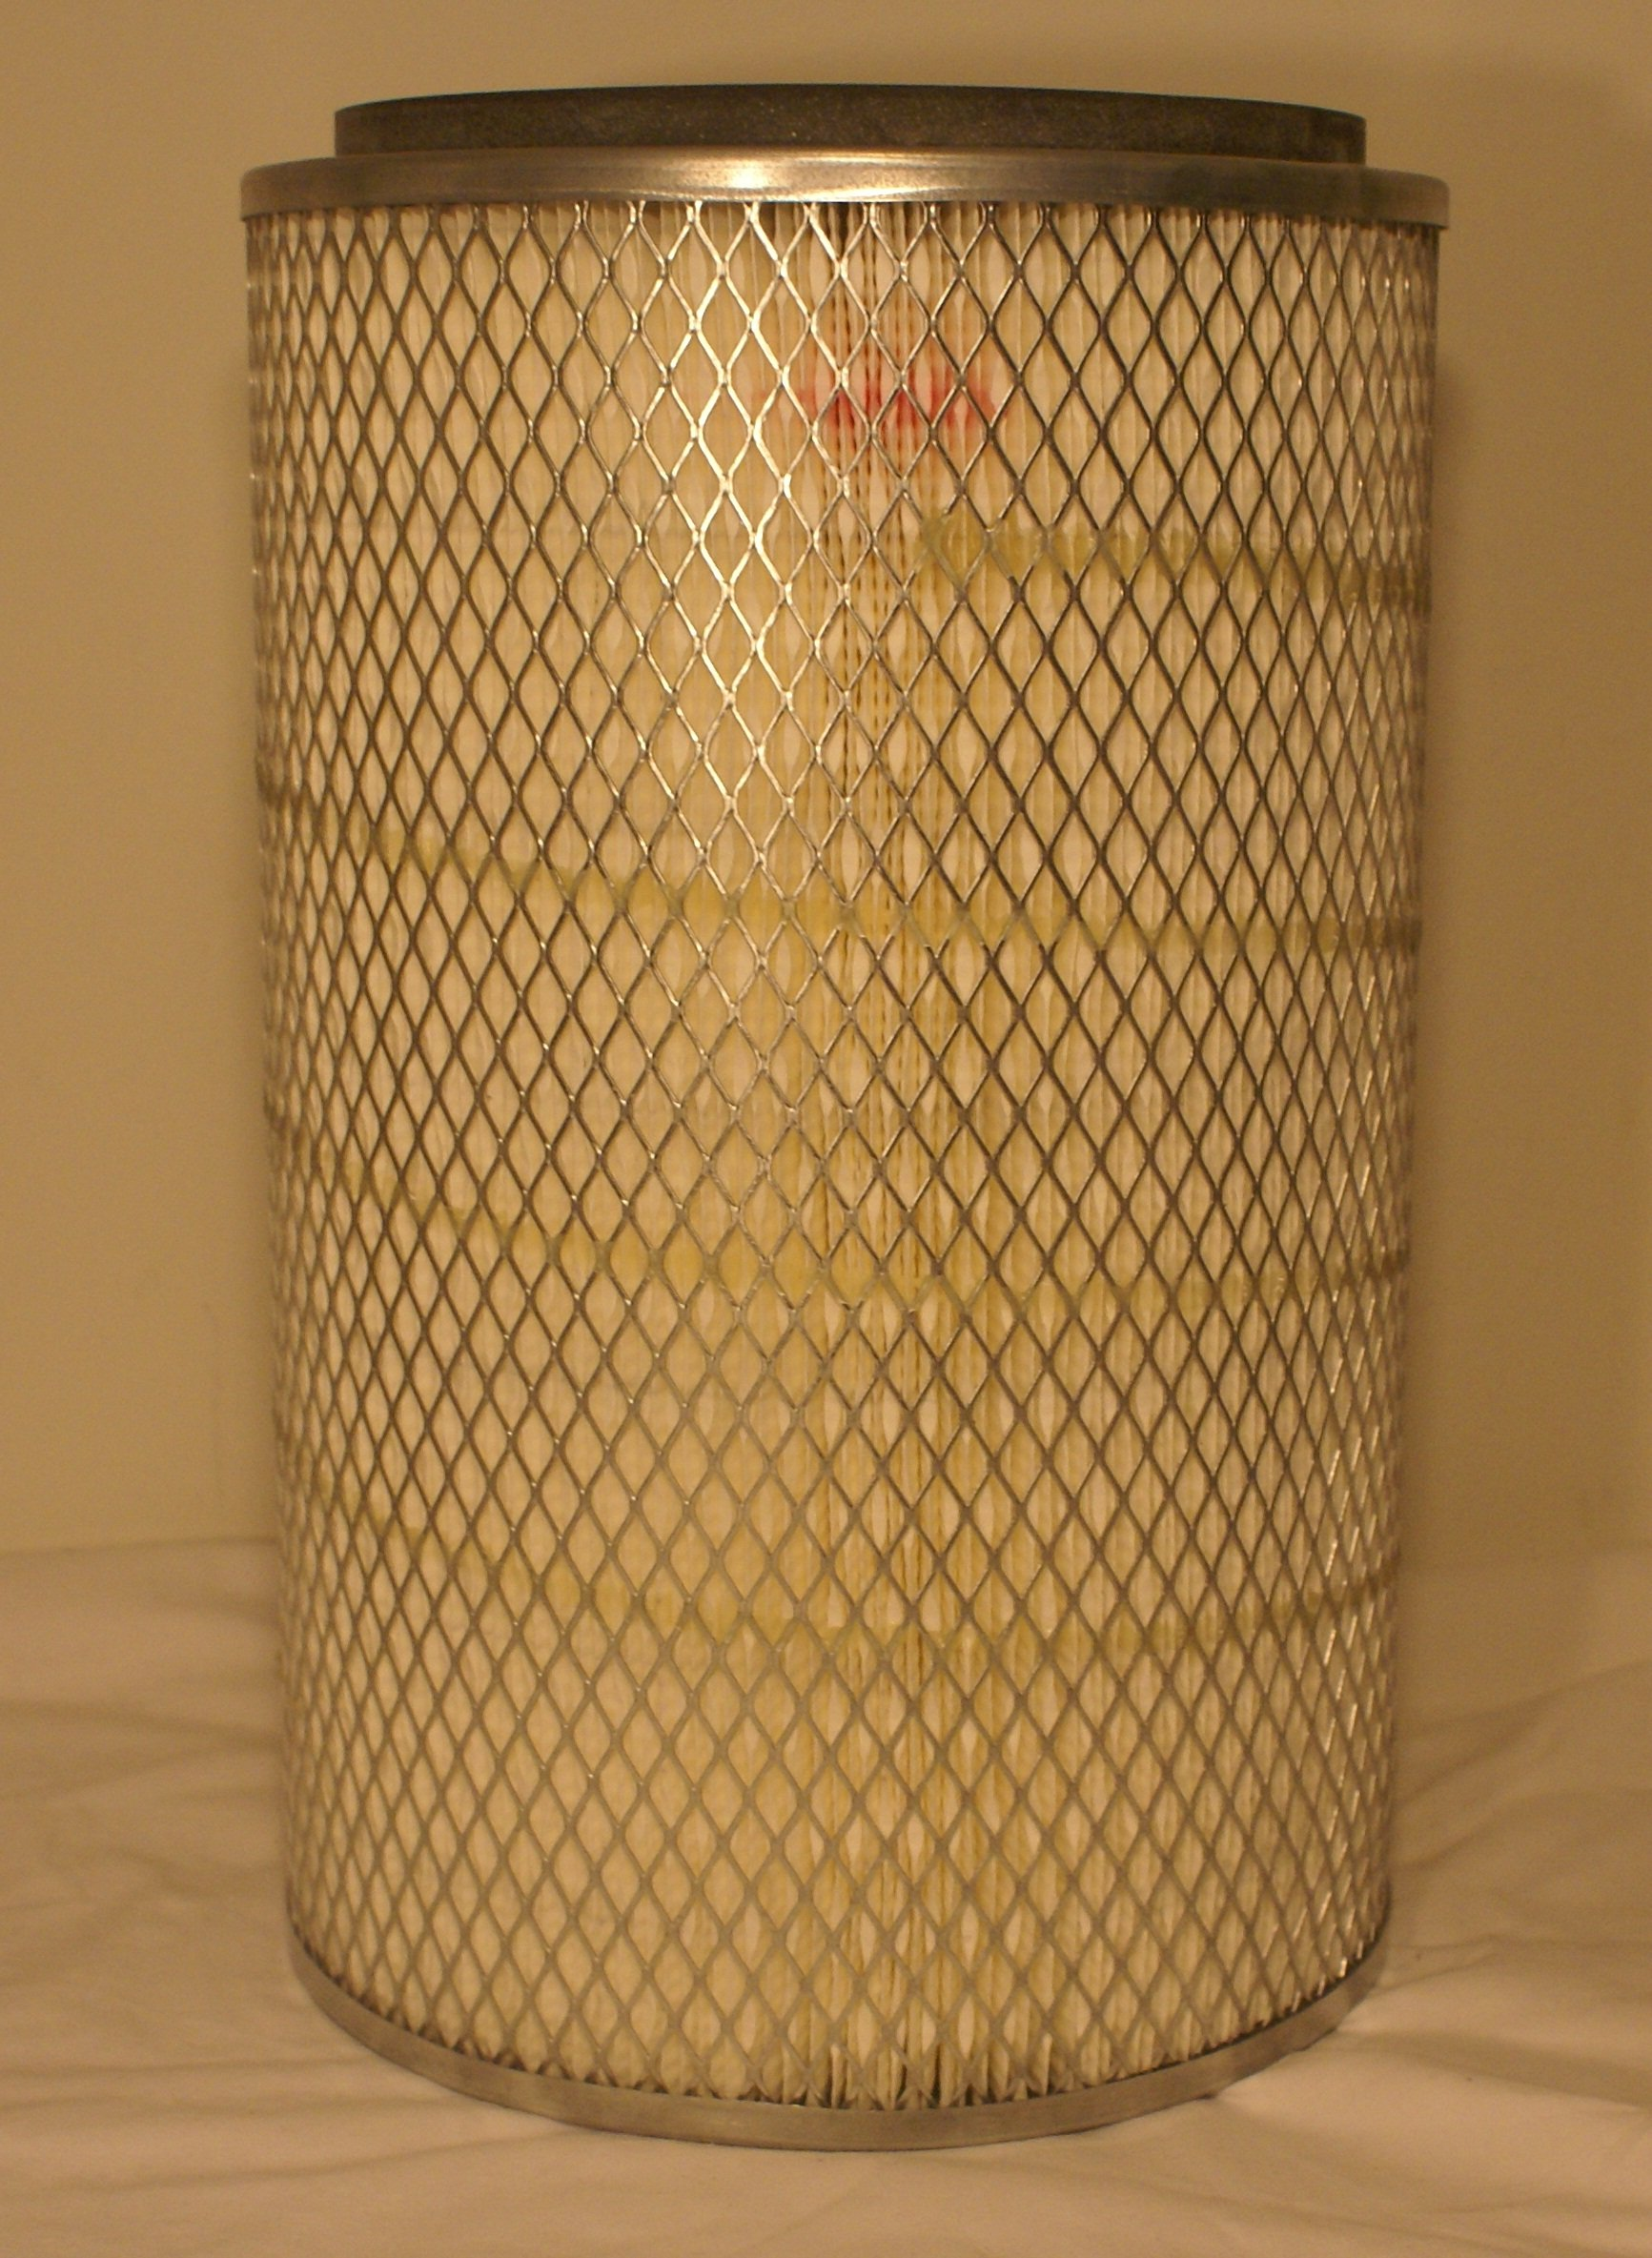 Fleetguard AF979 Air Filter